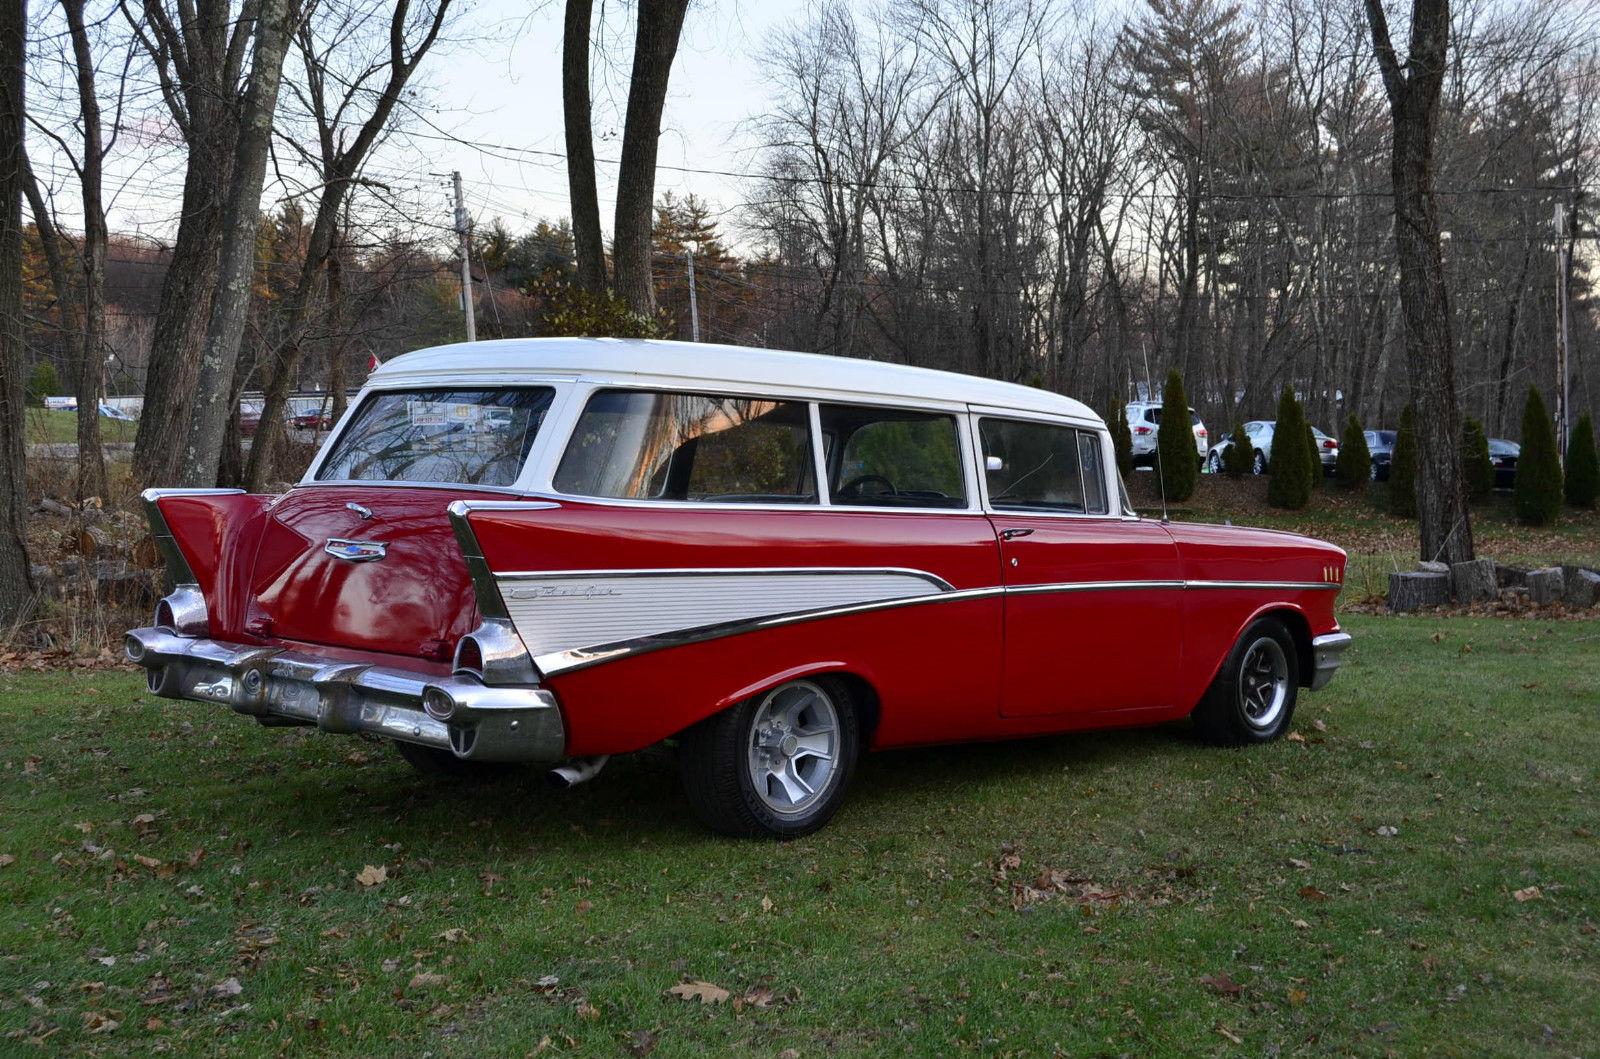 1957 Chevy 210 2 dr Handyman Station Wagon 350 Auto Disk ...